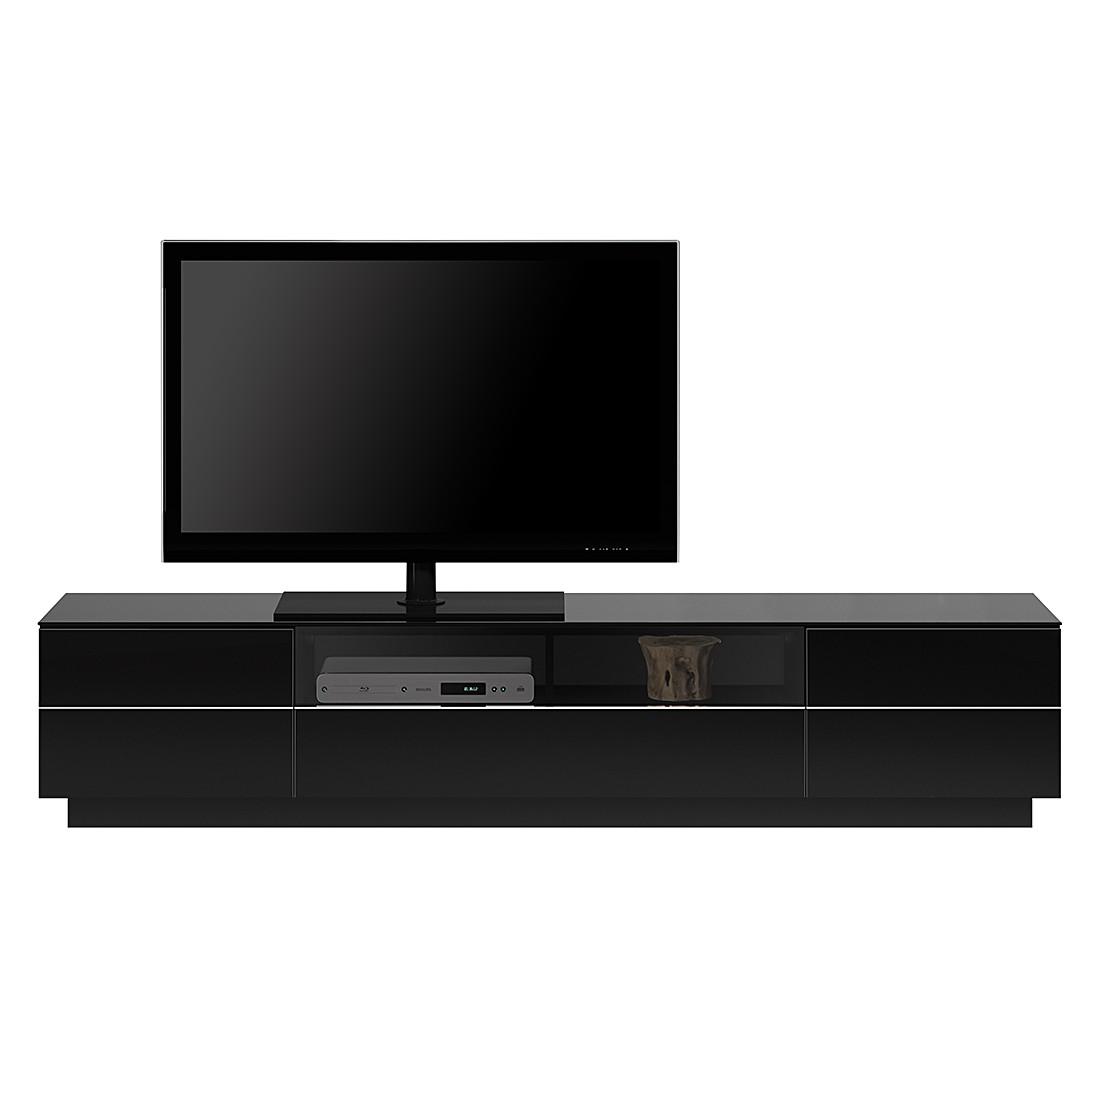 jahnke tv mobel katalog TV-Lowboard TL6202 - Hochglanz Schwarz